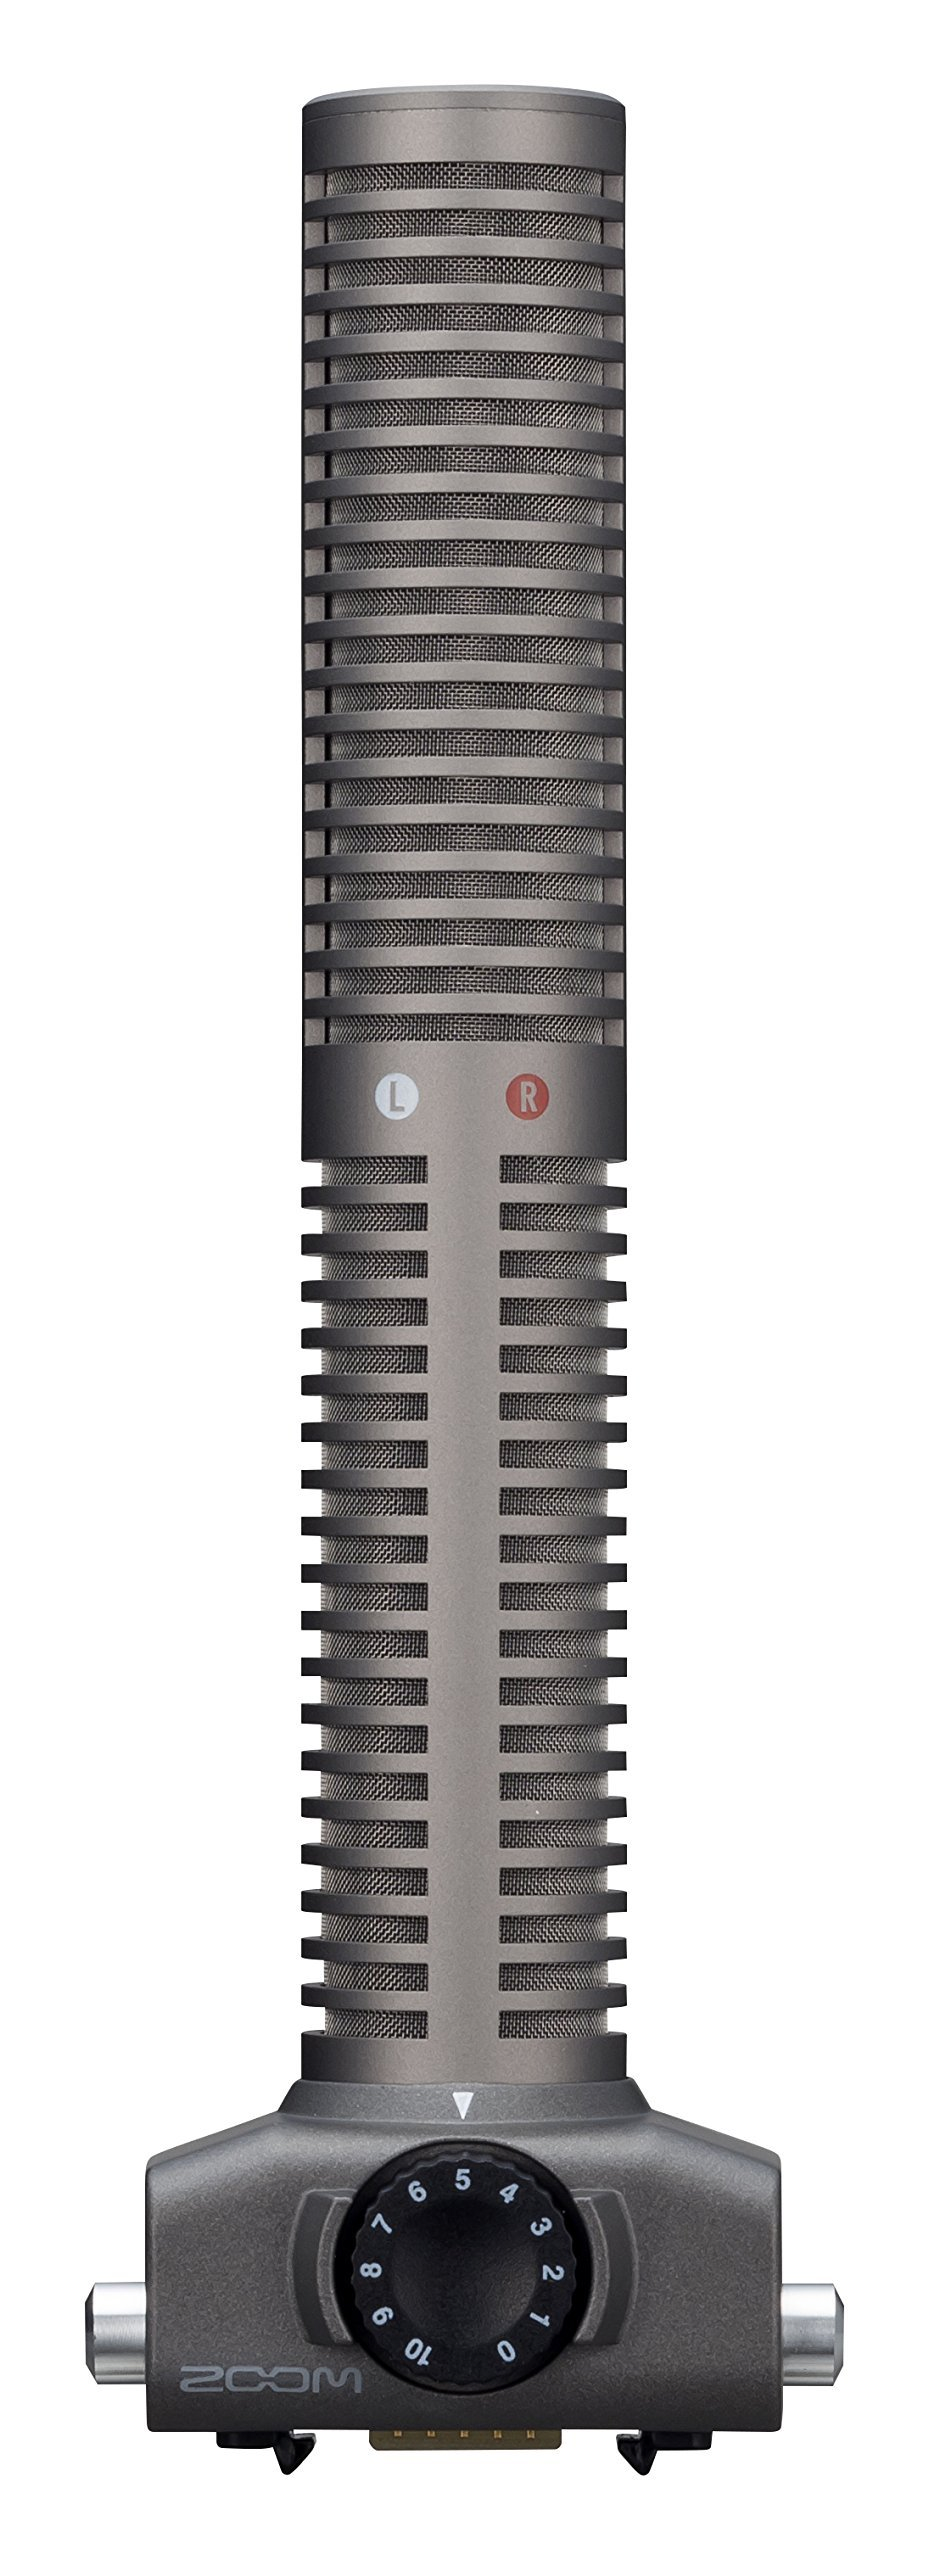 Zoom SSH-6 Stereo Shotgun Microphone Capsule (Renewed)